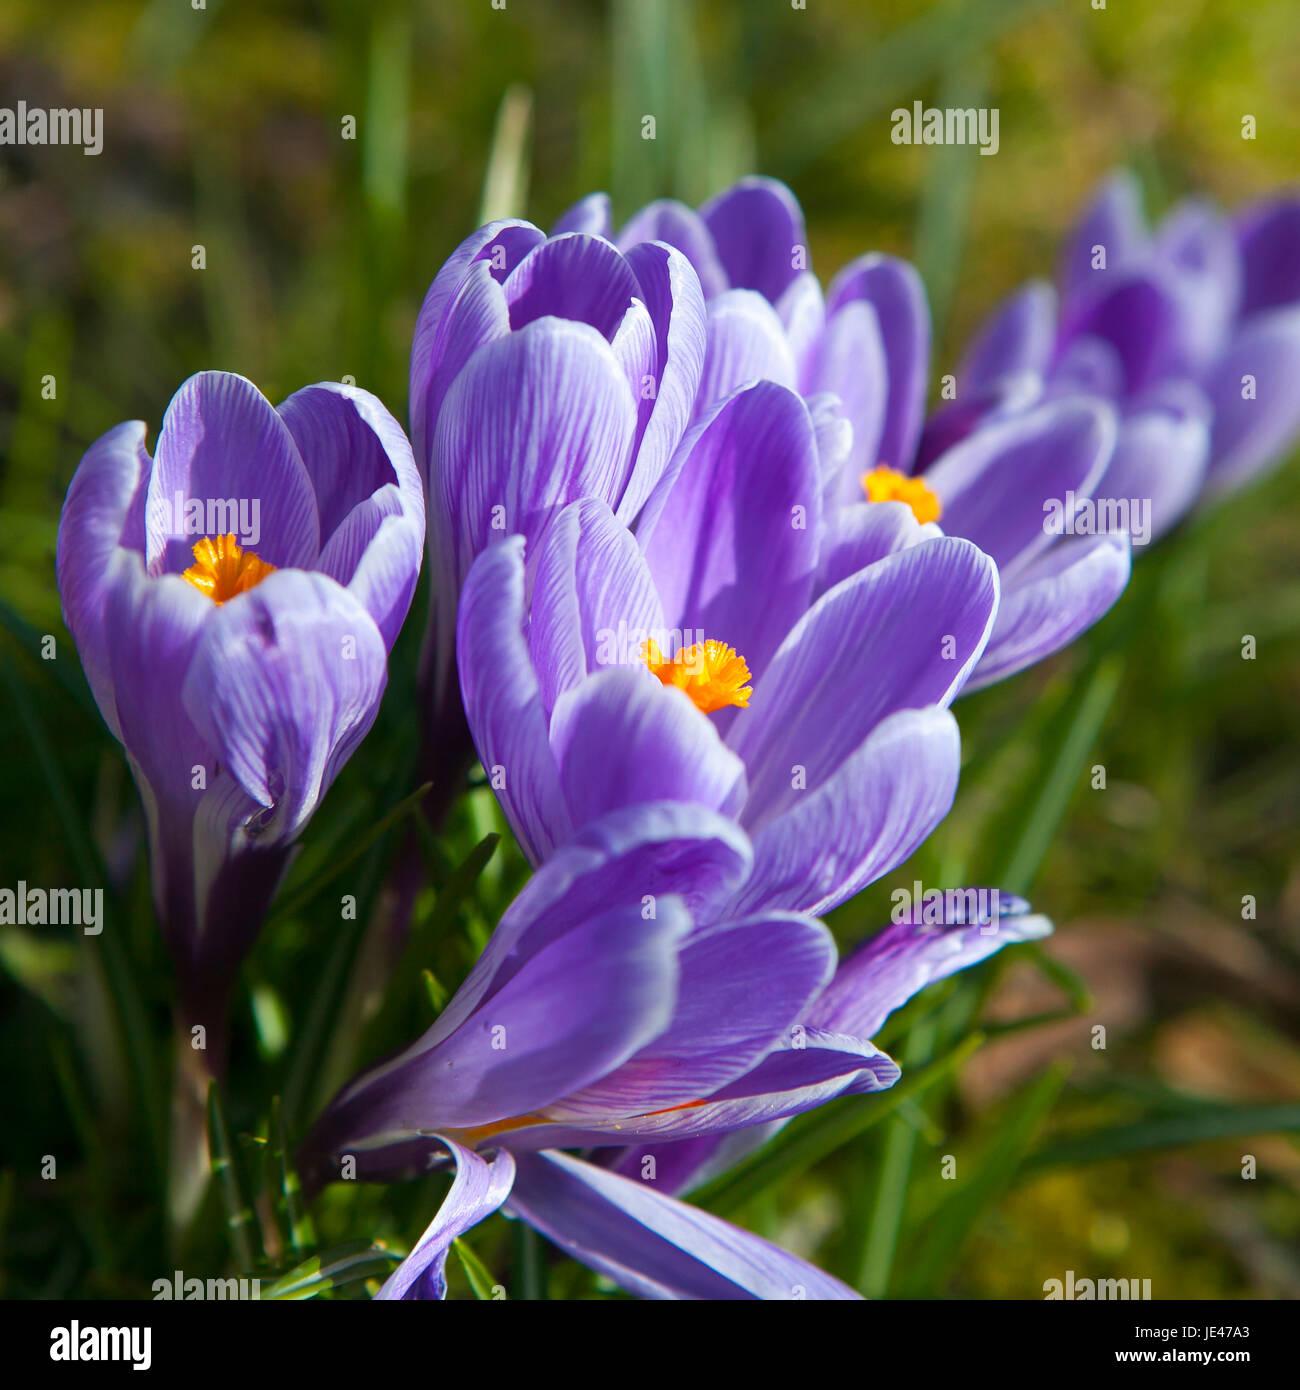 crocus (Crocus tommasinianus), blooming - Stock Image